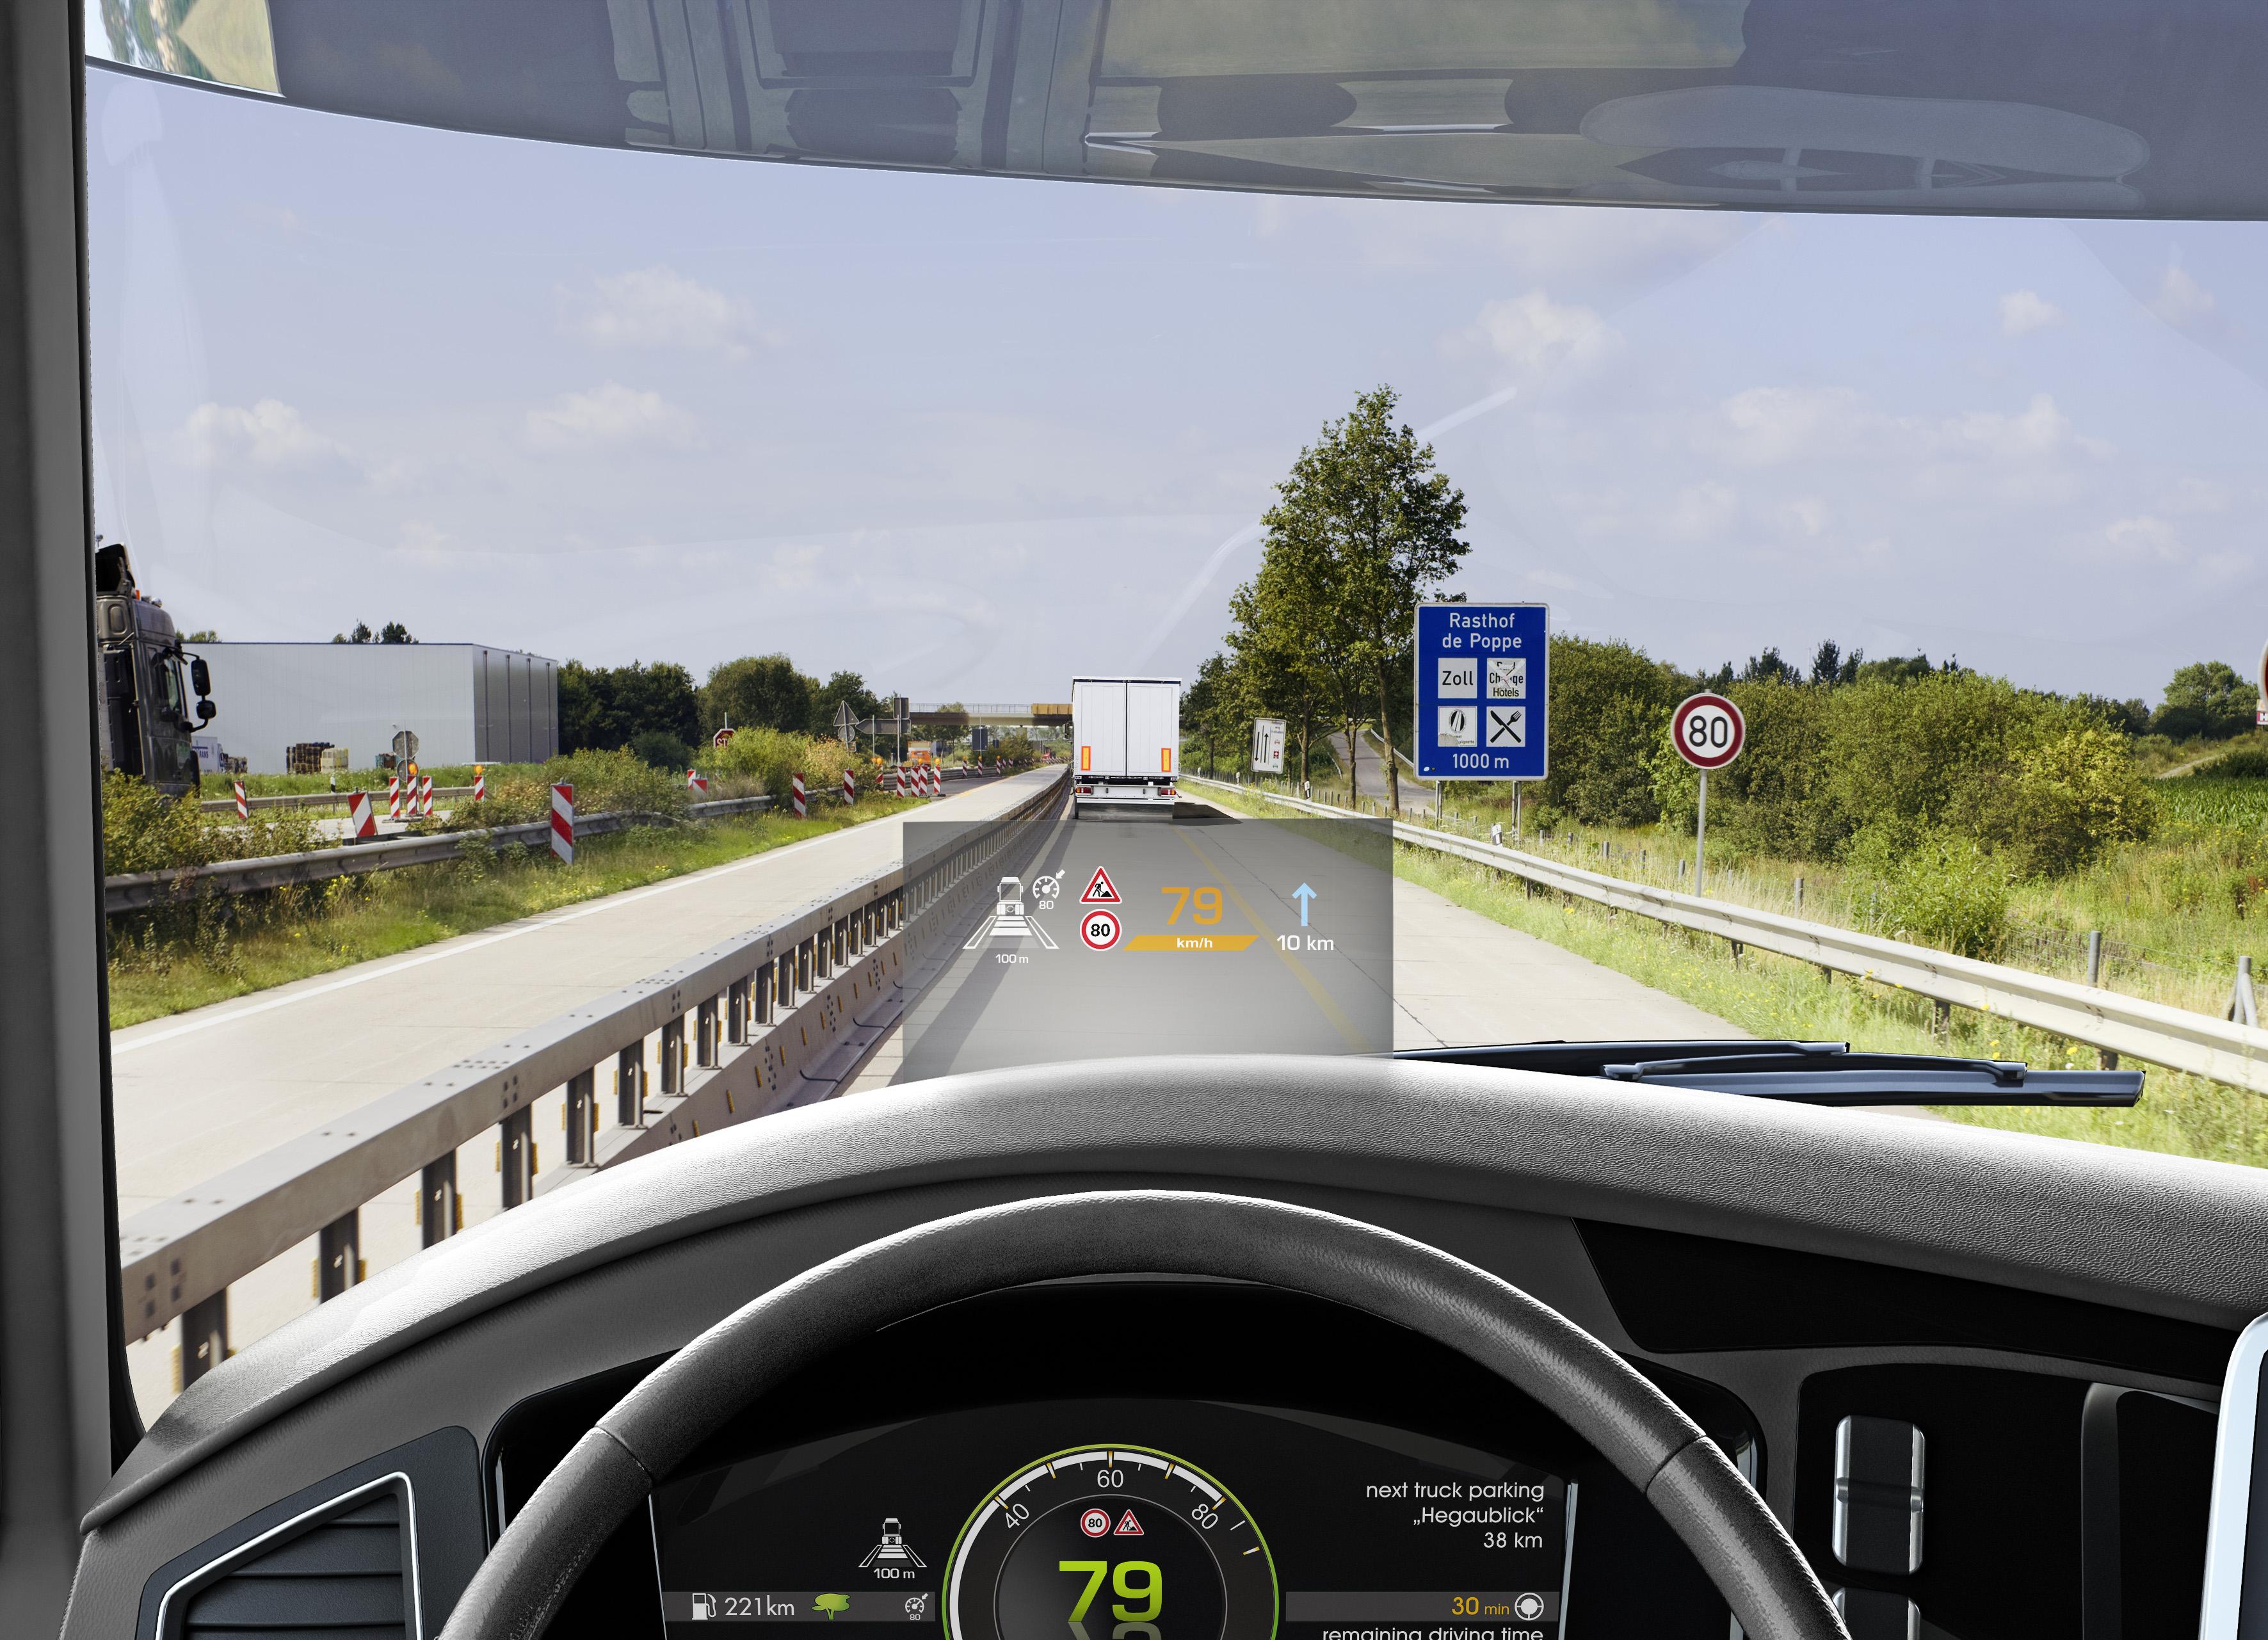 Continental Safety Technologies Help Build Road to Autonomous Vehicles